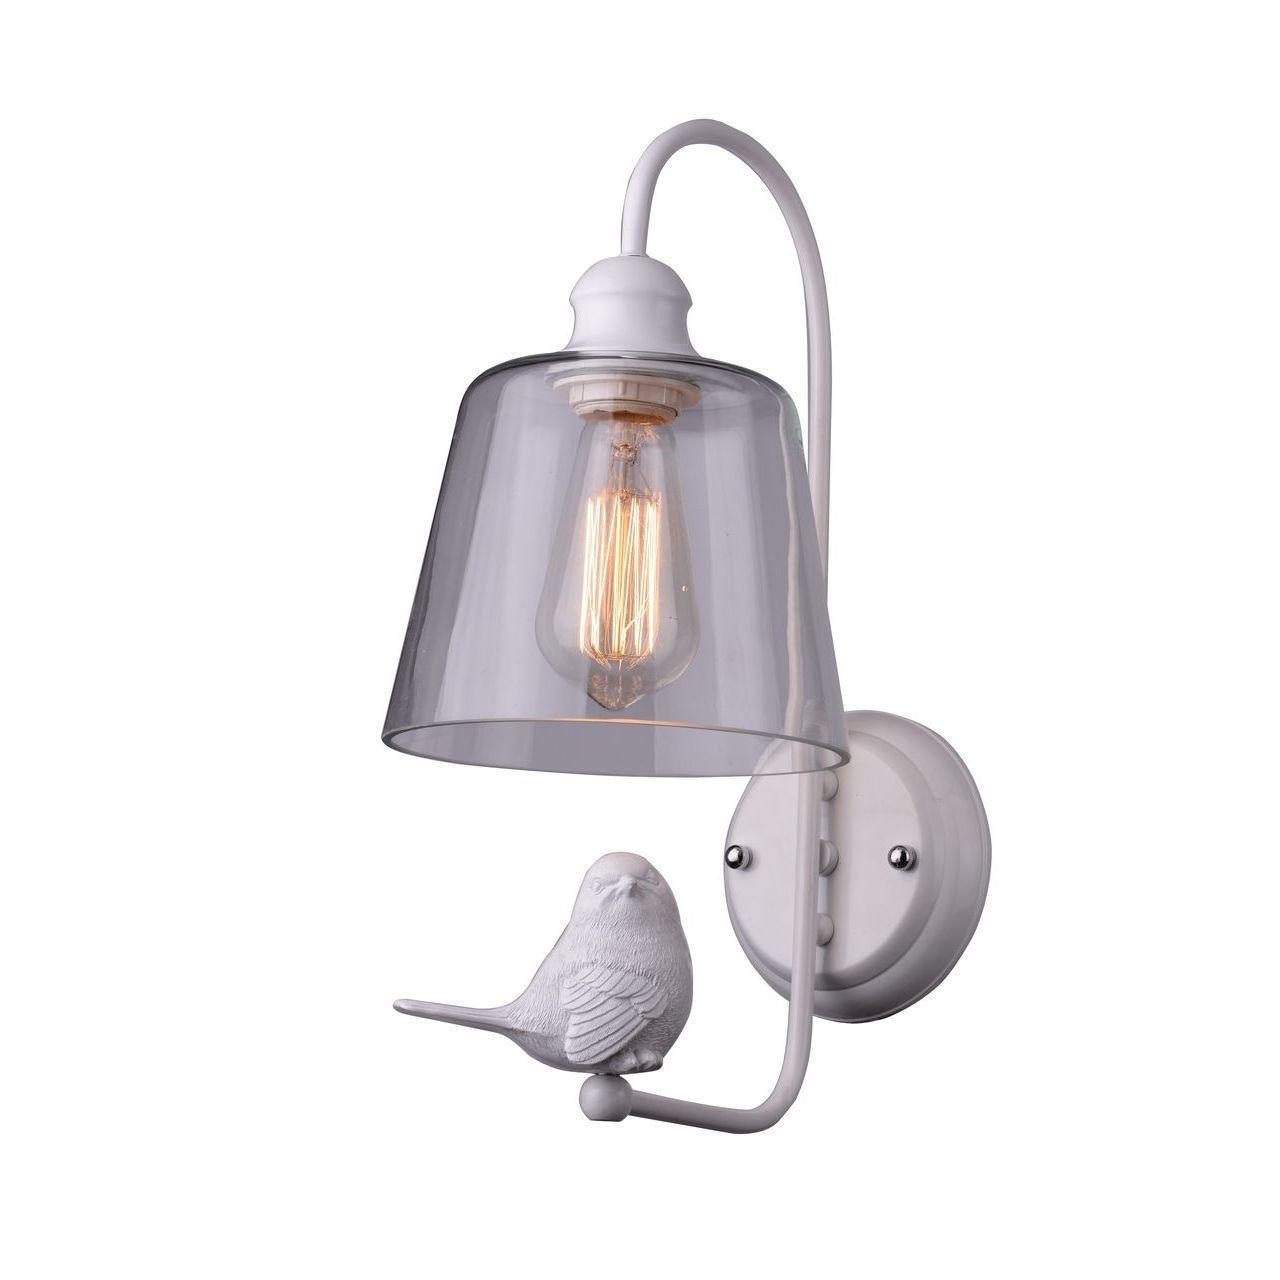 Бра Arte Lamp Passero A4289AP-1WH бра arte lamp passero 1 х e27 40 w a4289ap 1wh